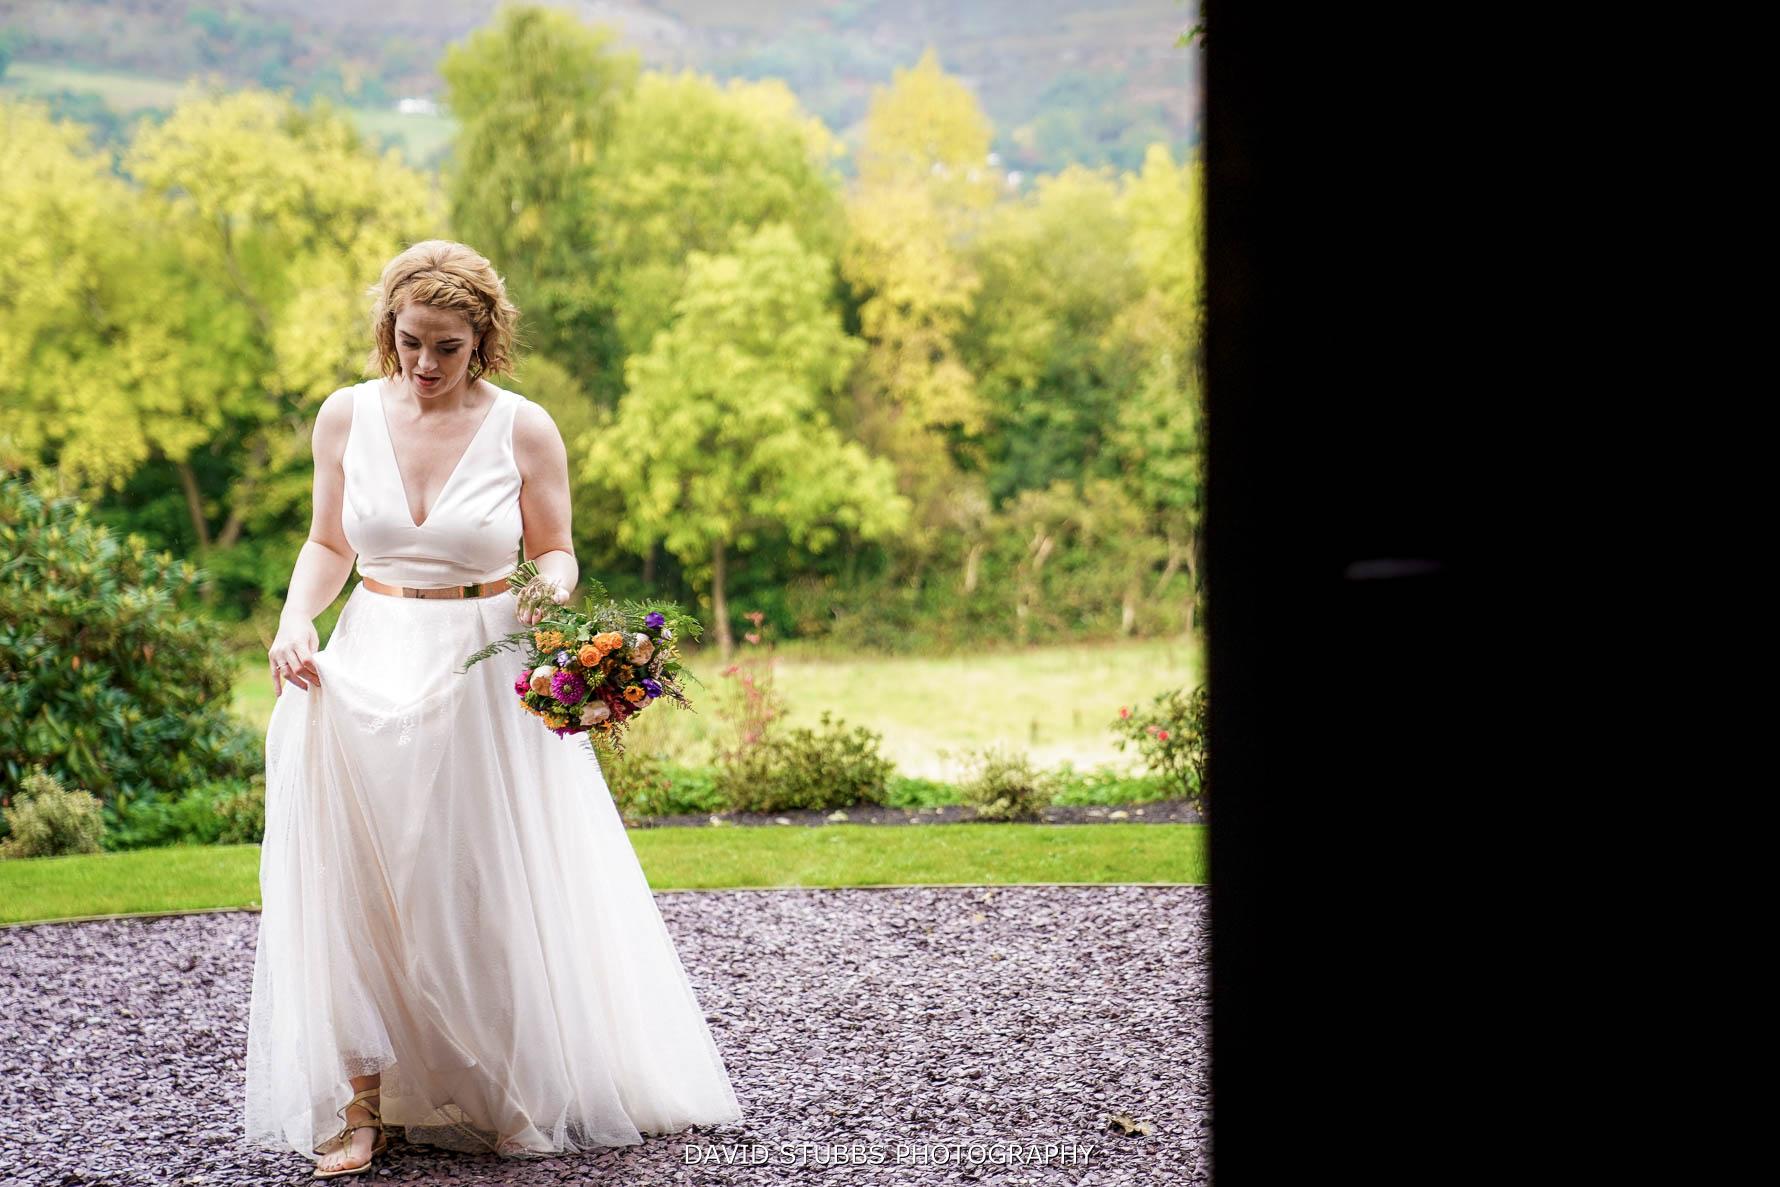 bride photographed through the doorway